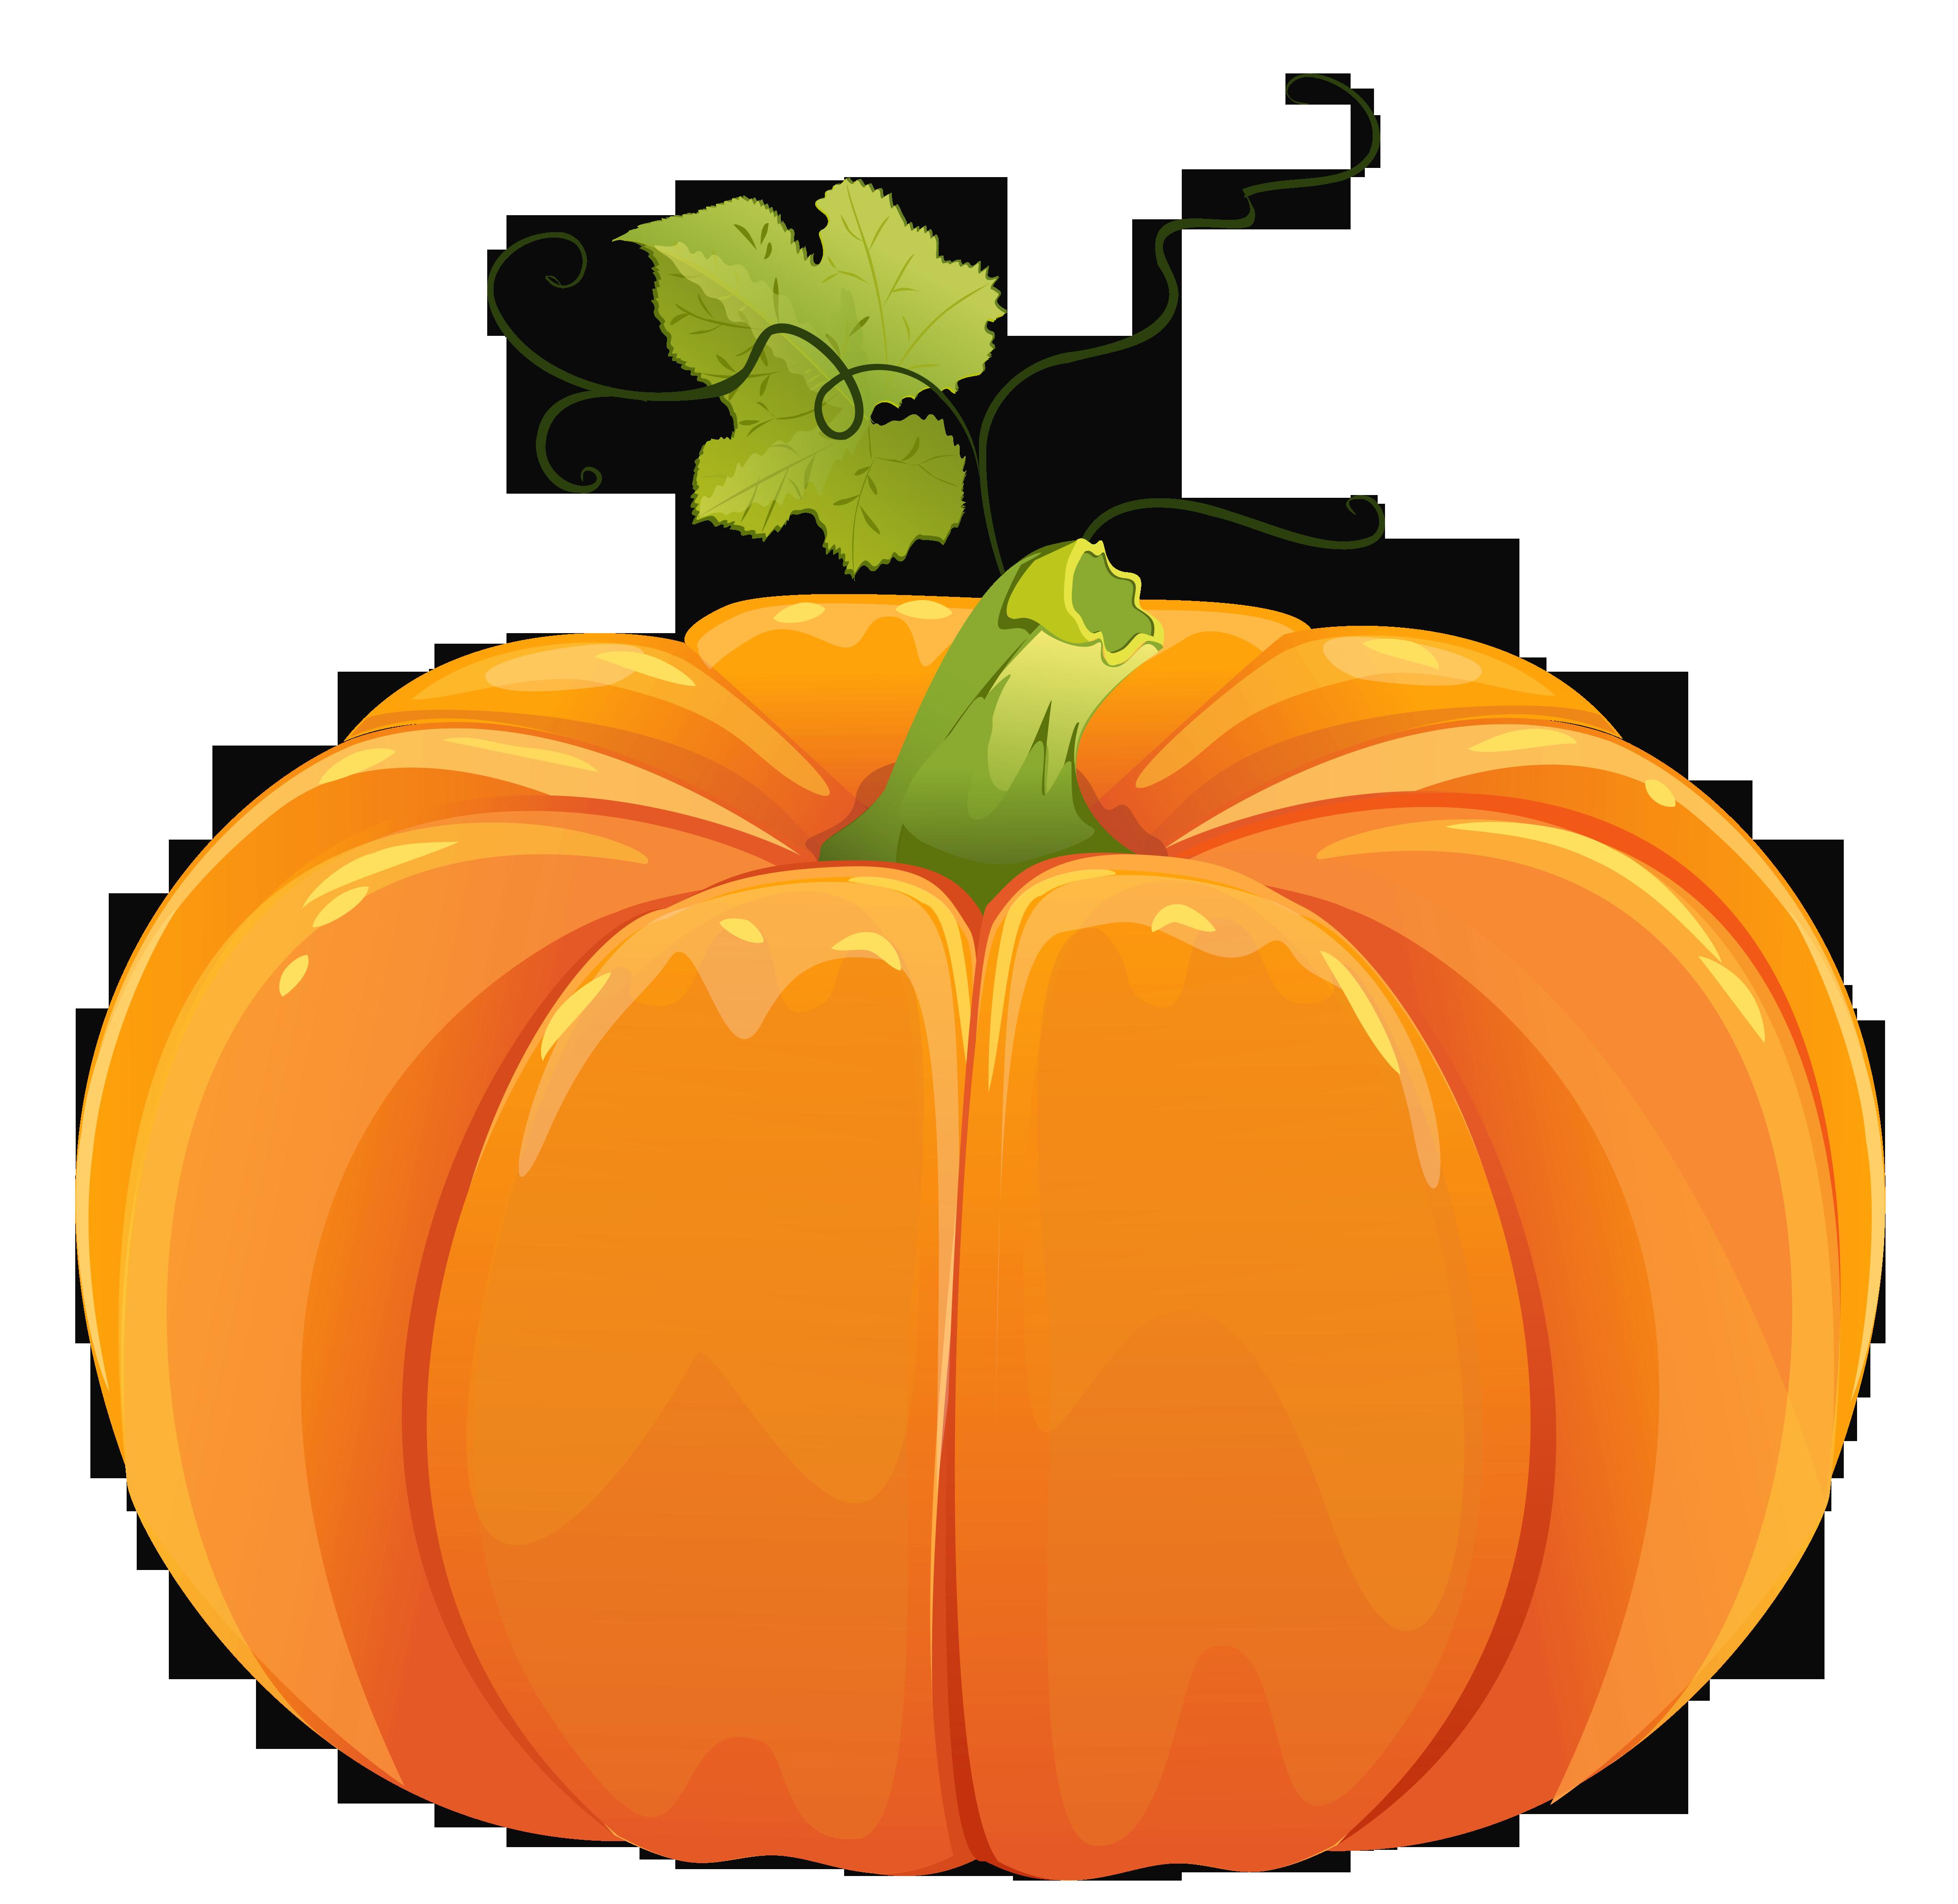 Free Autumn Pumpkin Cliparts, Download Free Clip Art, Free.